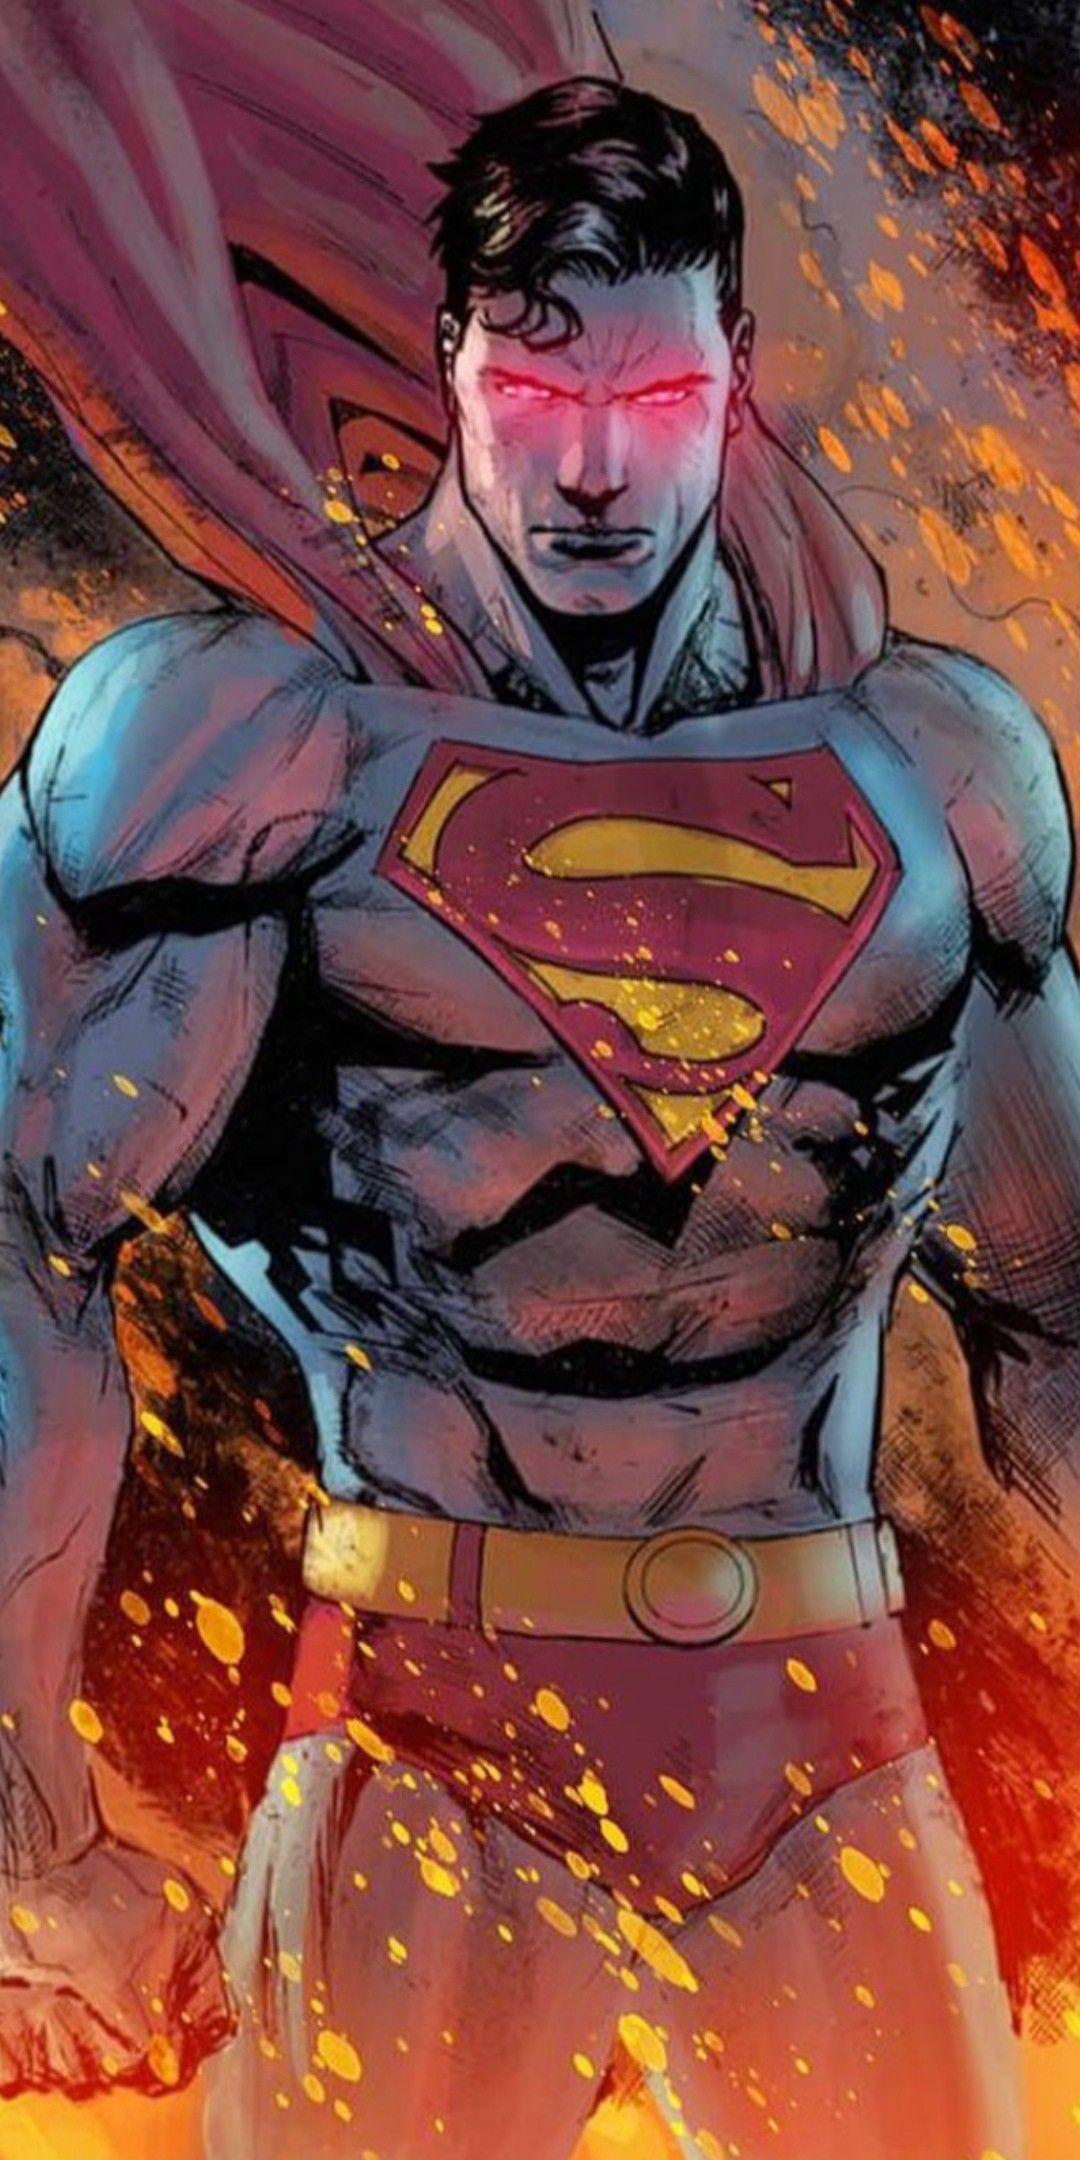 Pin by Jorge Otero on superman | Superman comic, Superman art, Superman  wallpaper